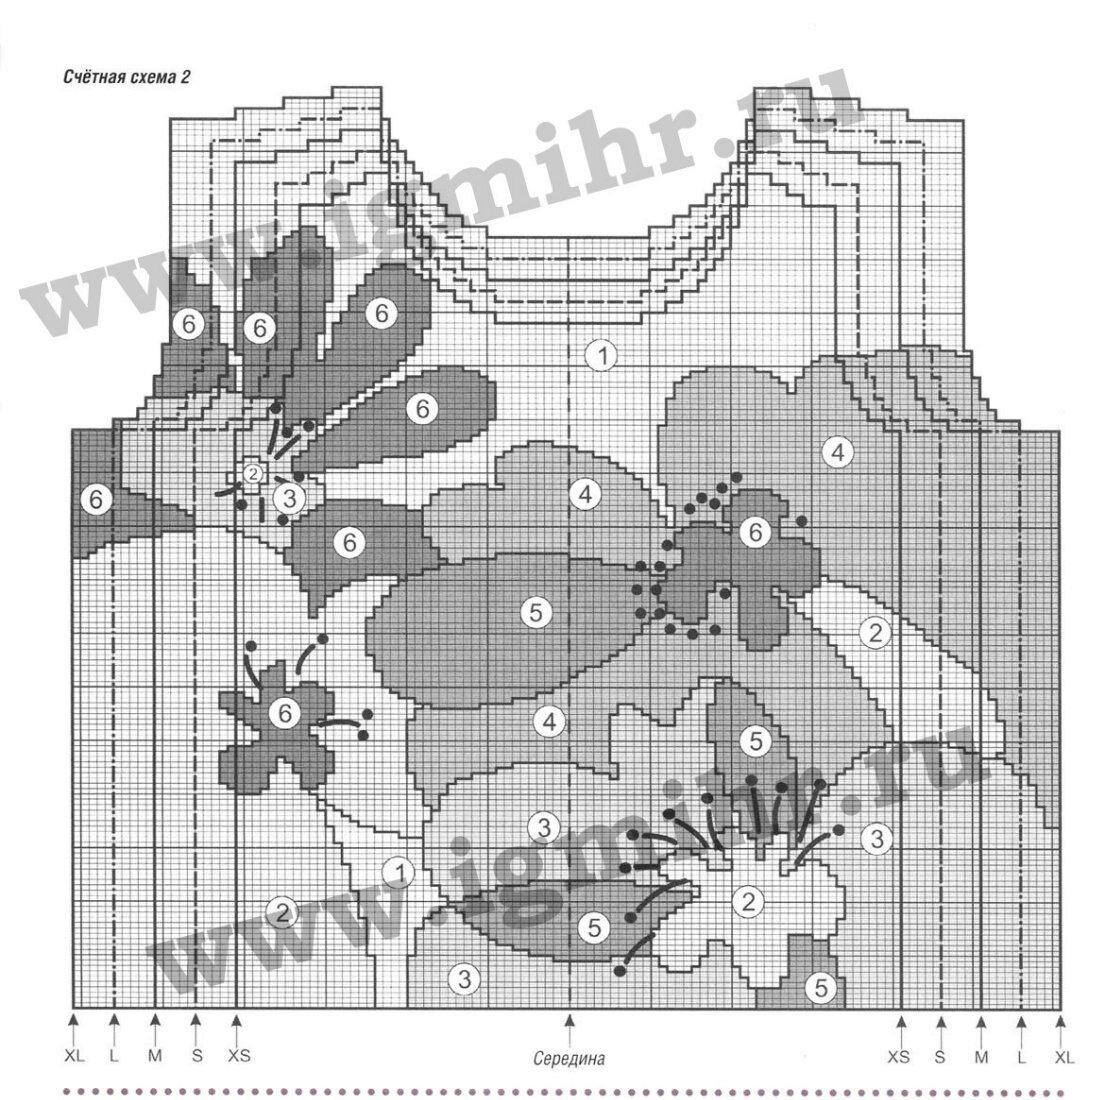 http://img-fotki.yandex.ru/get/9254/211045765.3/0_cedaa_299d6e7e_XXXL.jpg